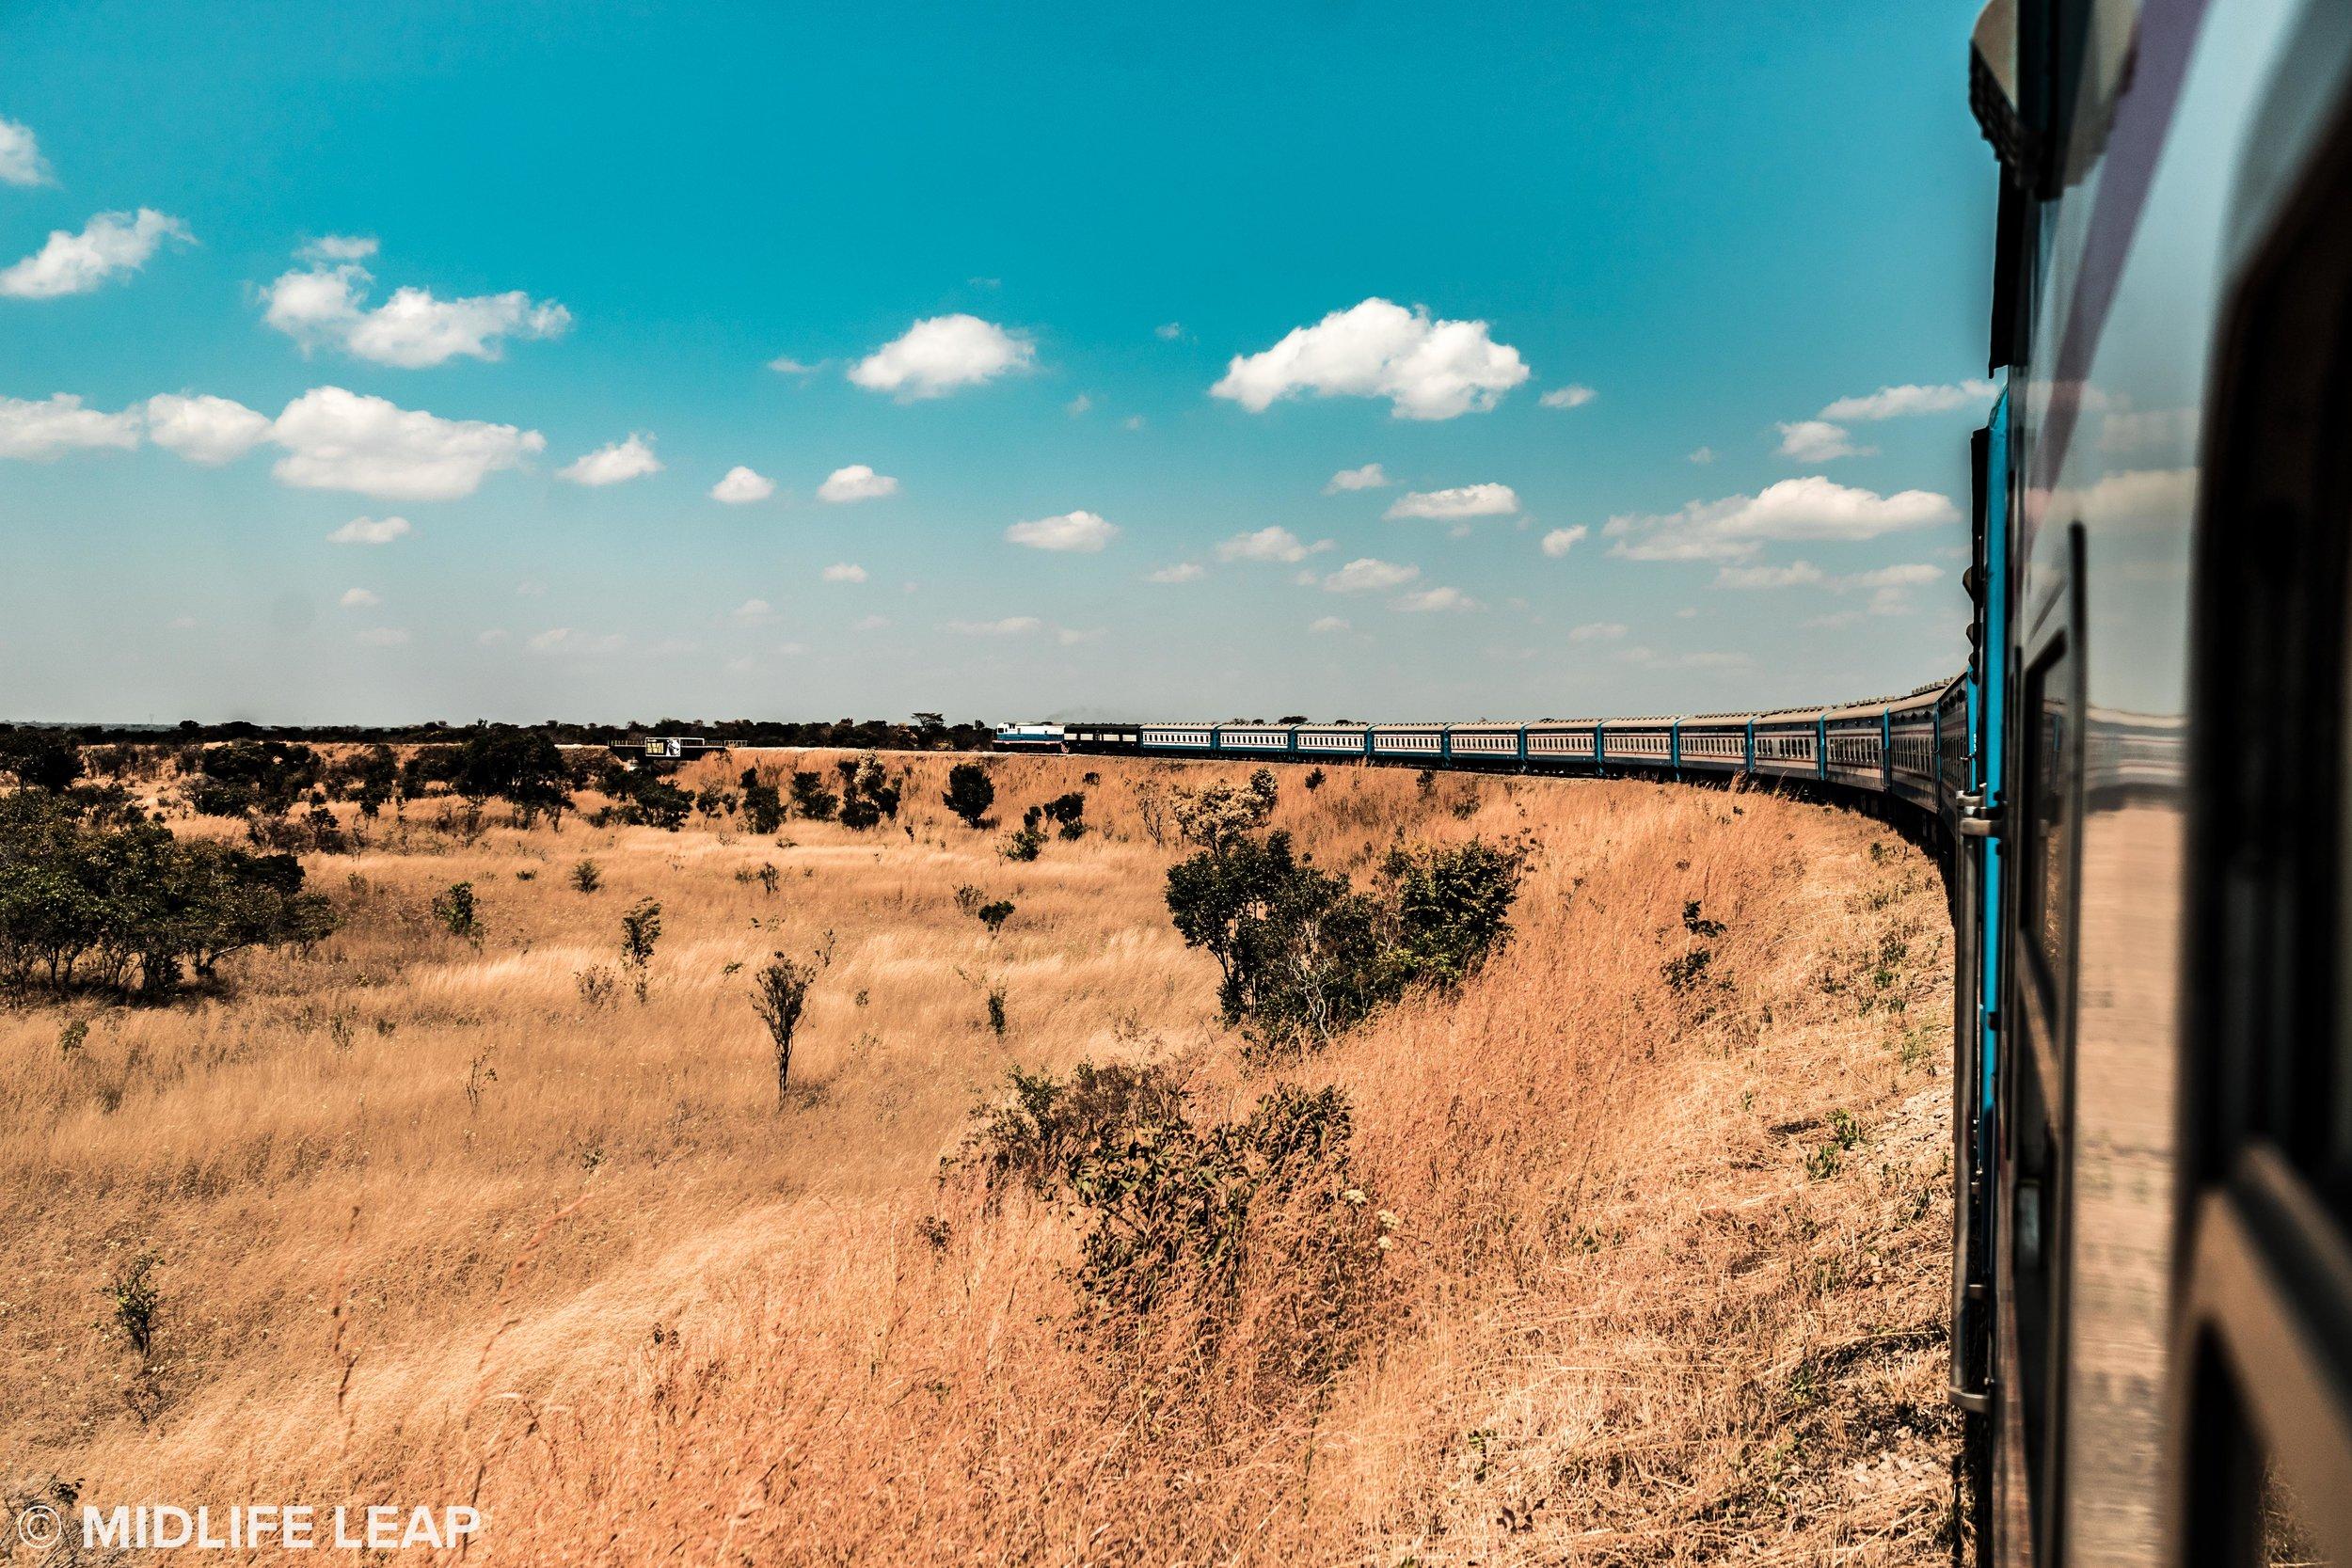 traveling-through-africa-on-the-tazara-train